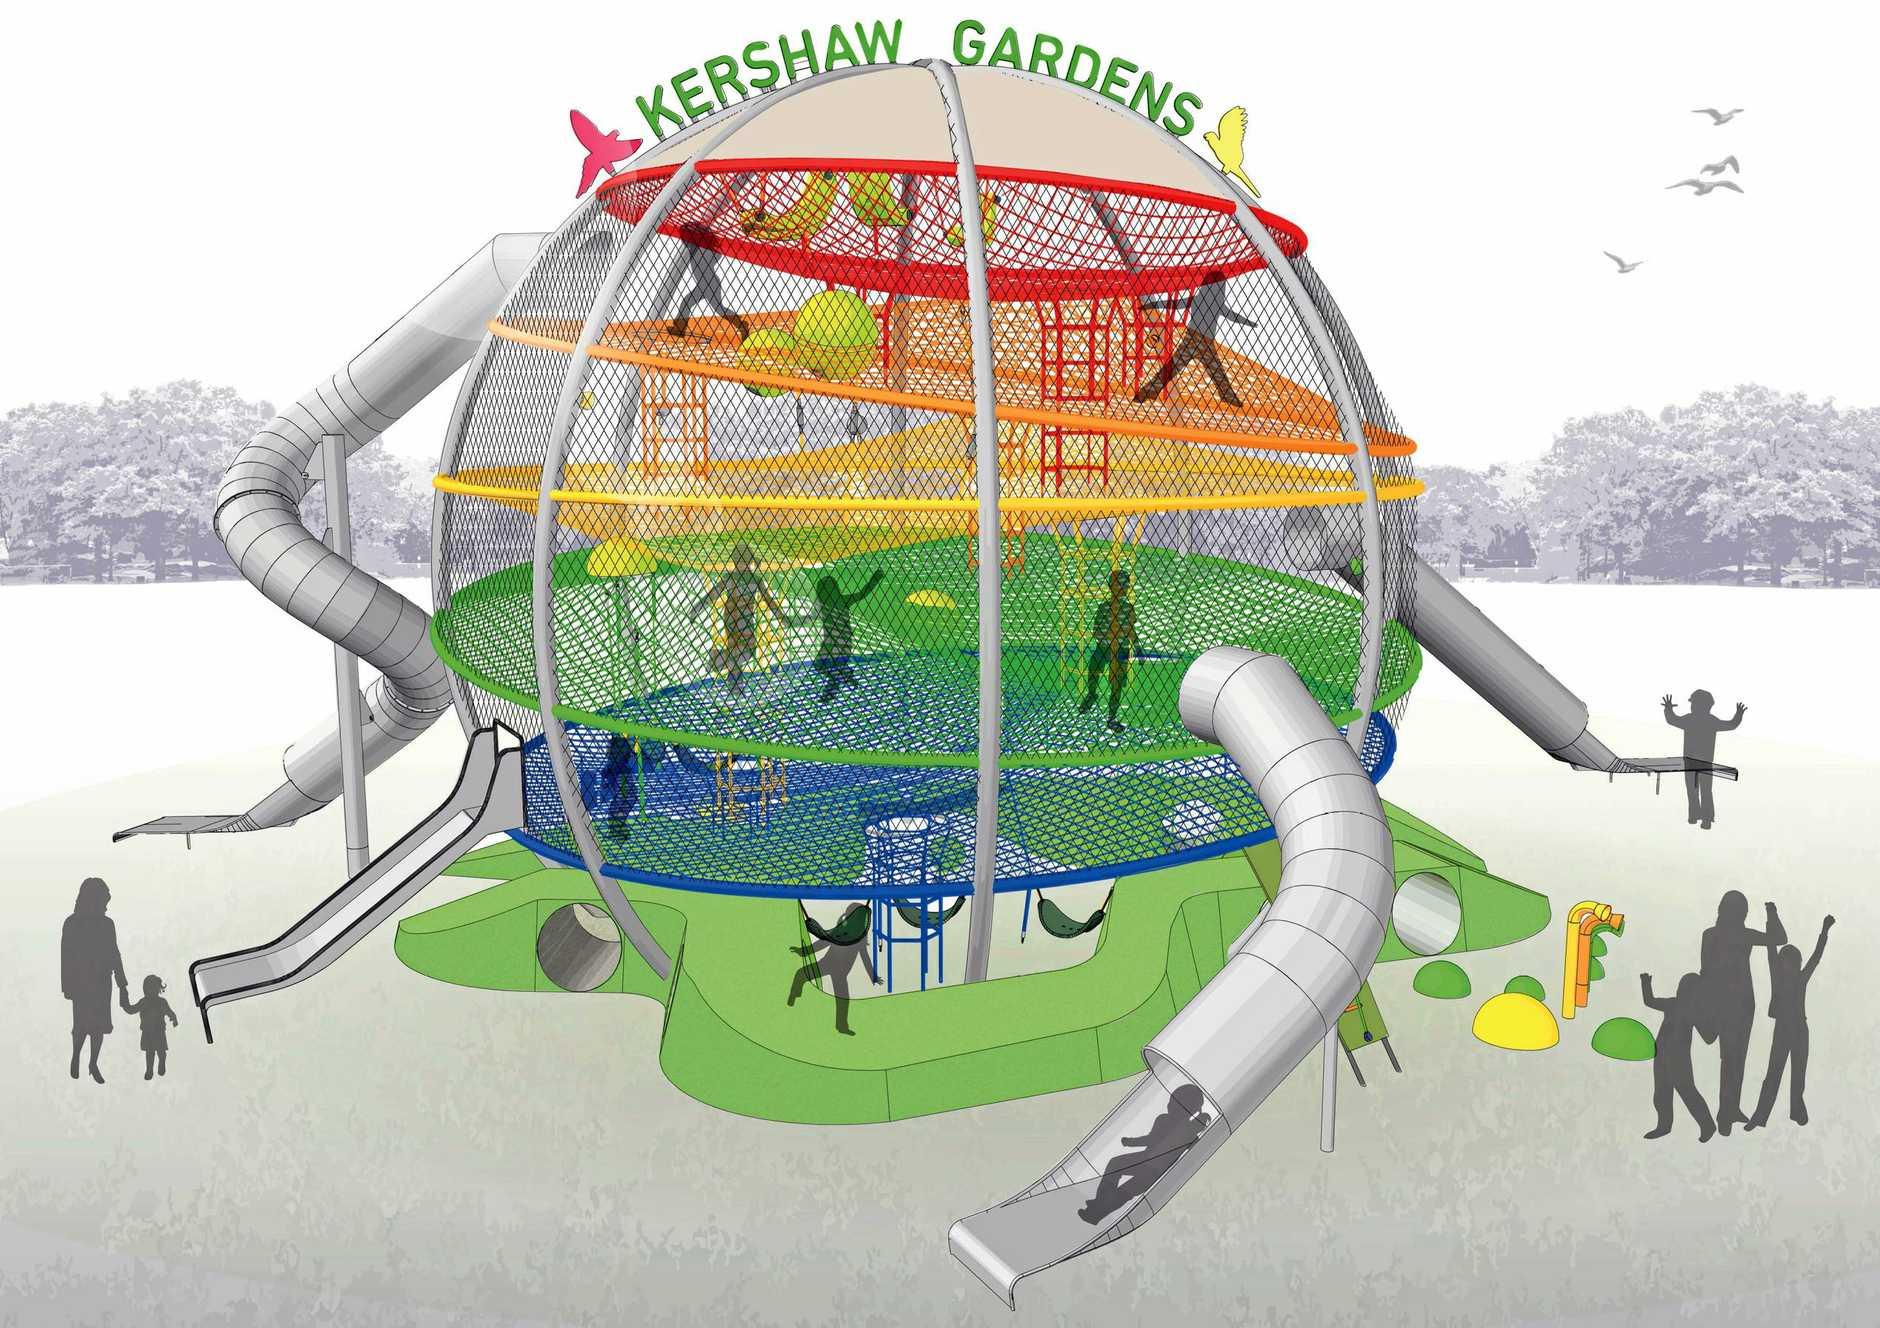 Concept designs plans for Kershaw Garden's Wyatt's Wonder Web.